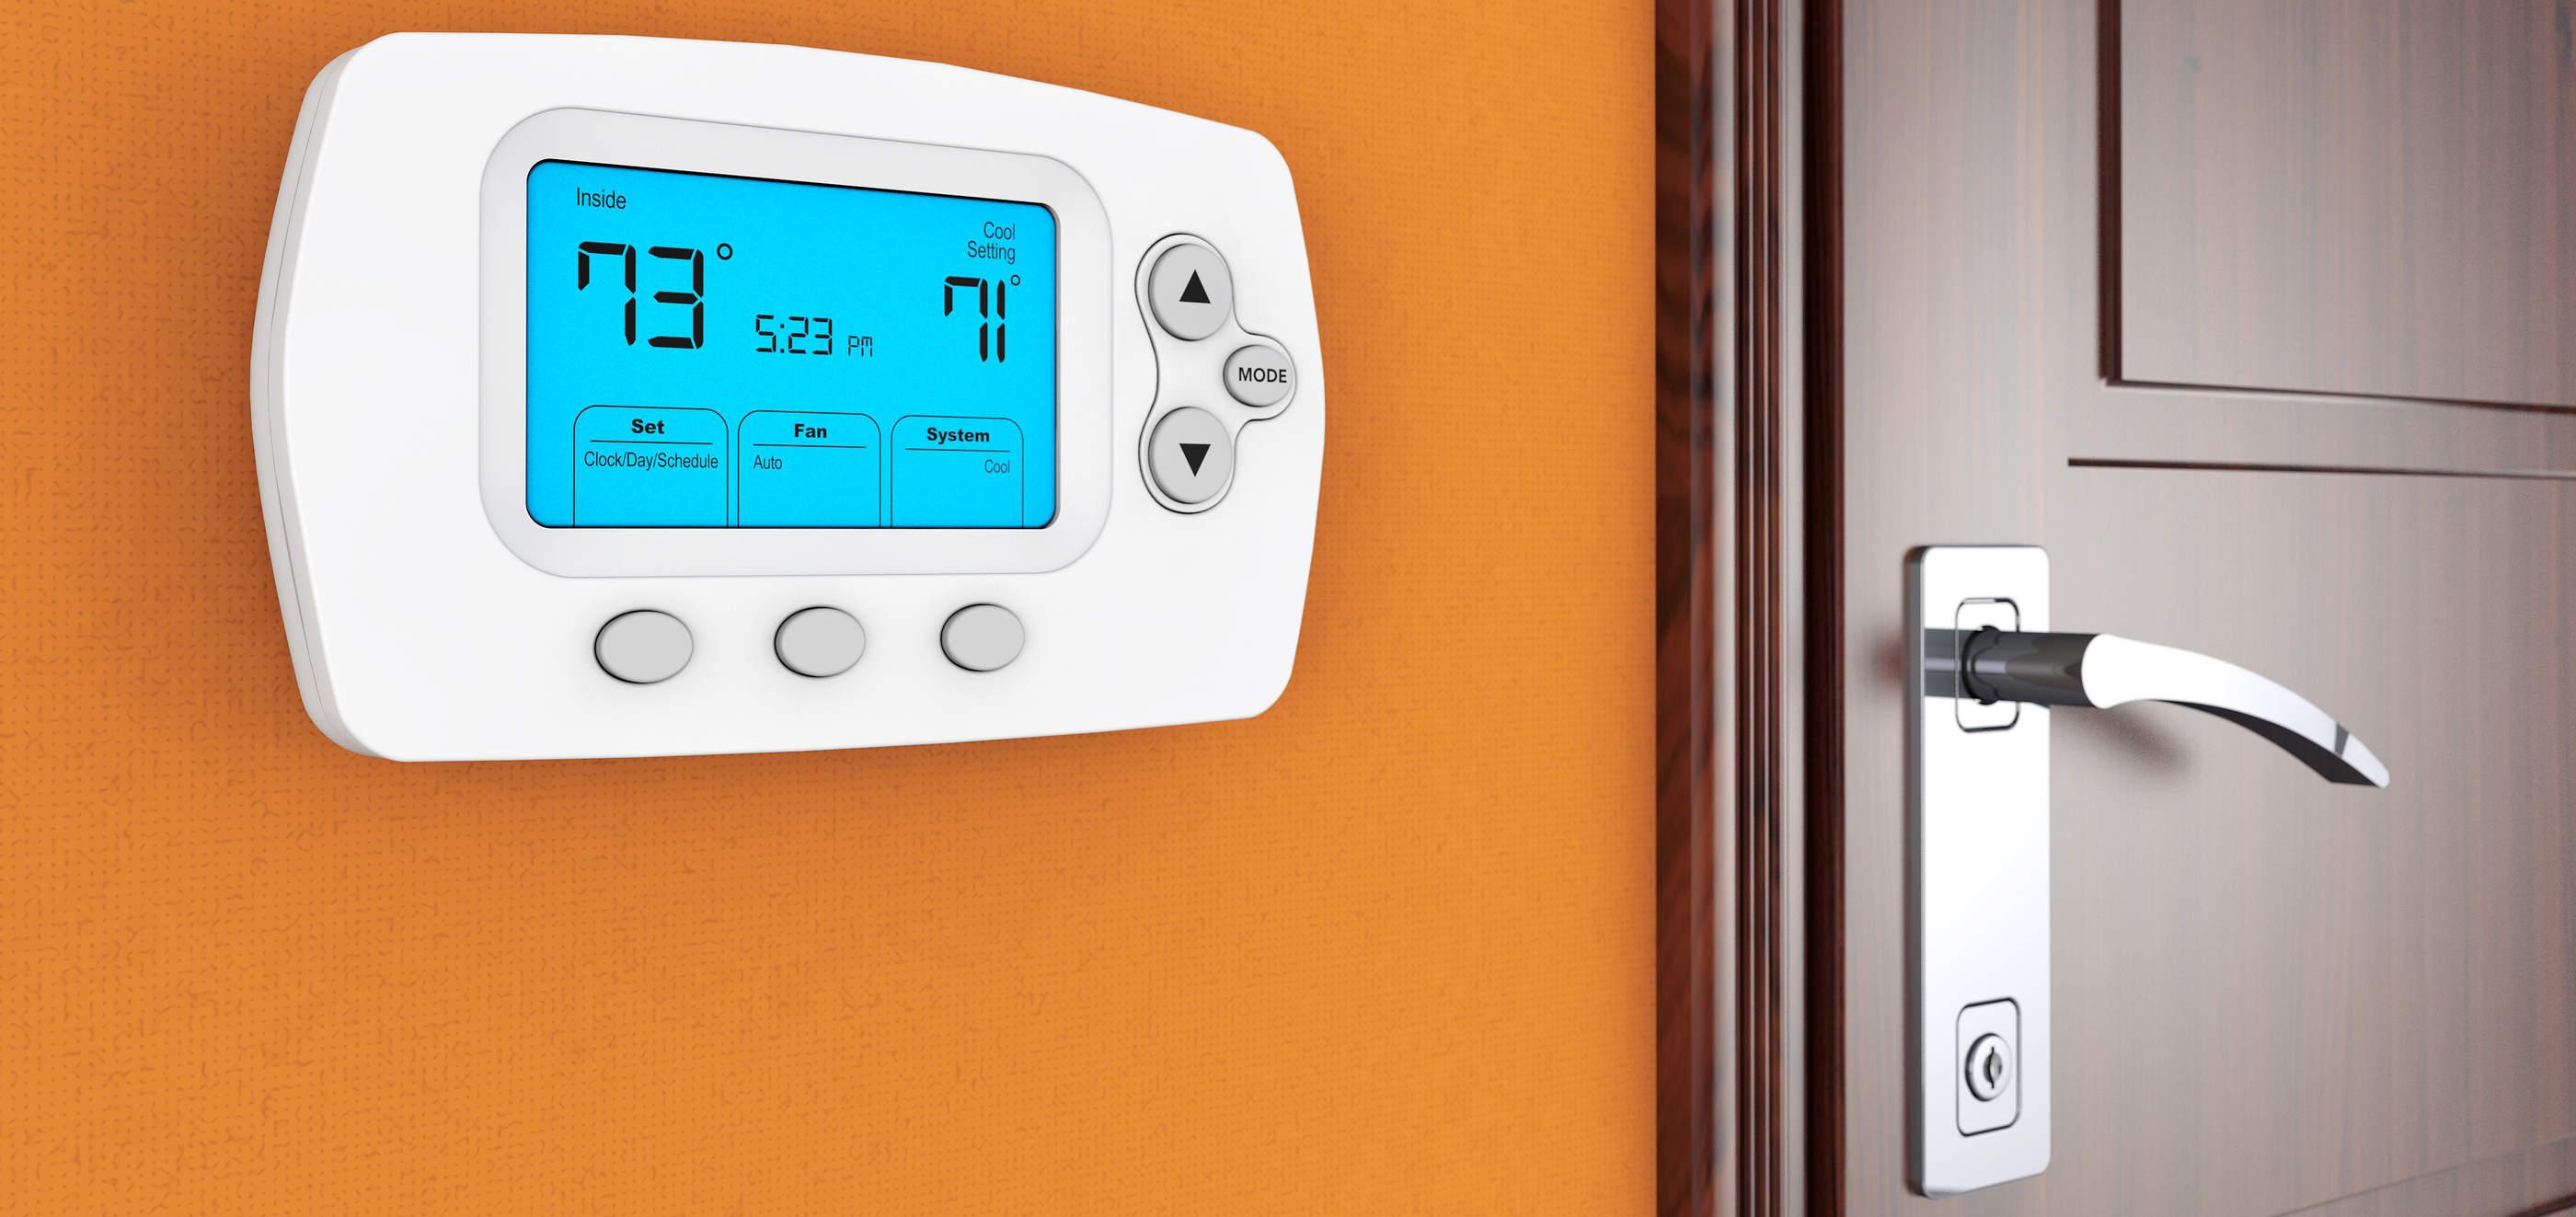 bigstock-Modern-Programming-Thermostat-81429269-reduced